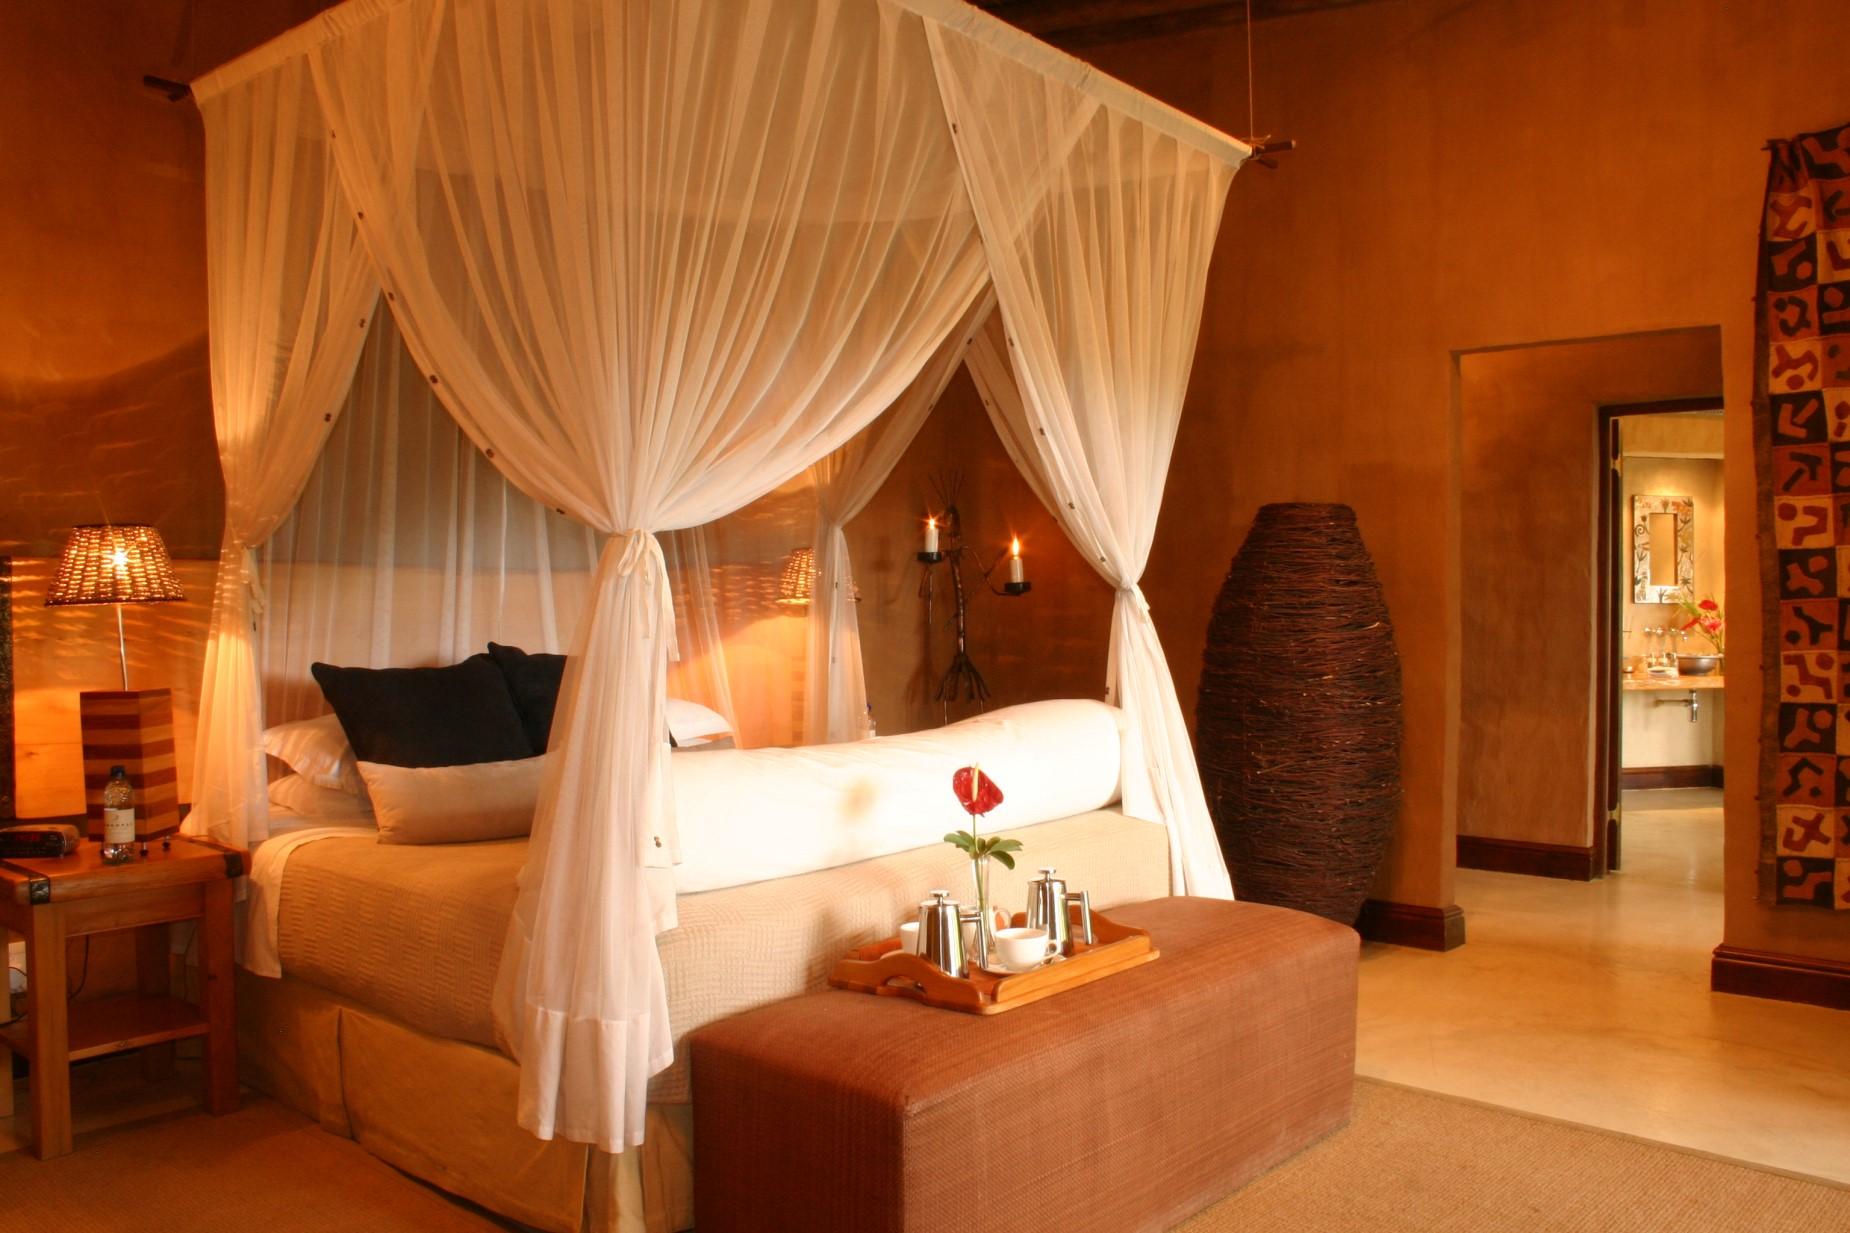 Interior Room 8